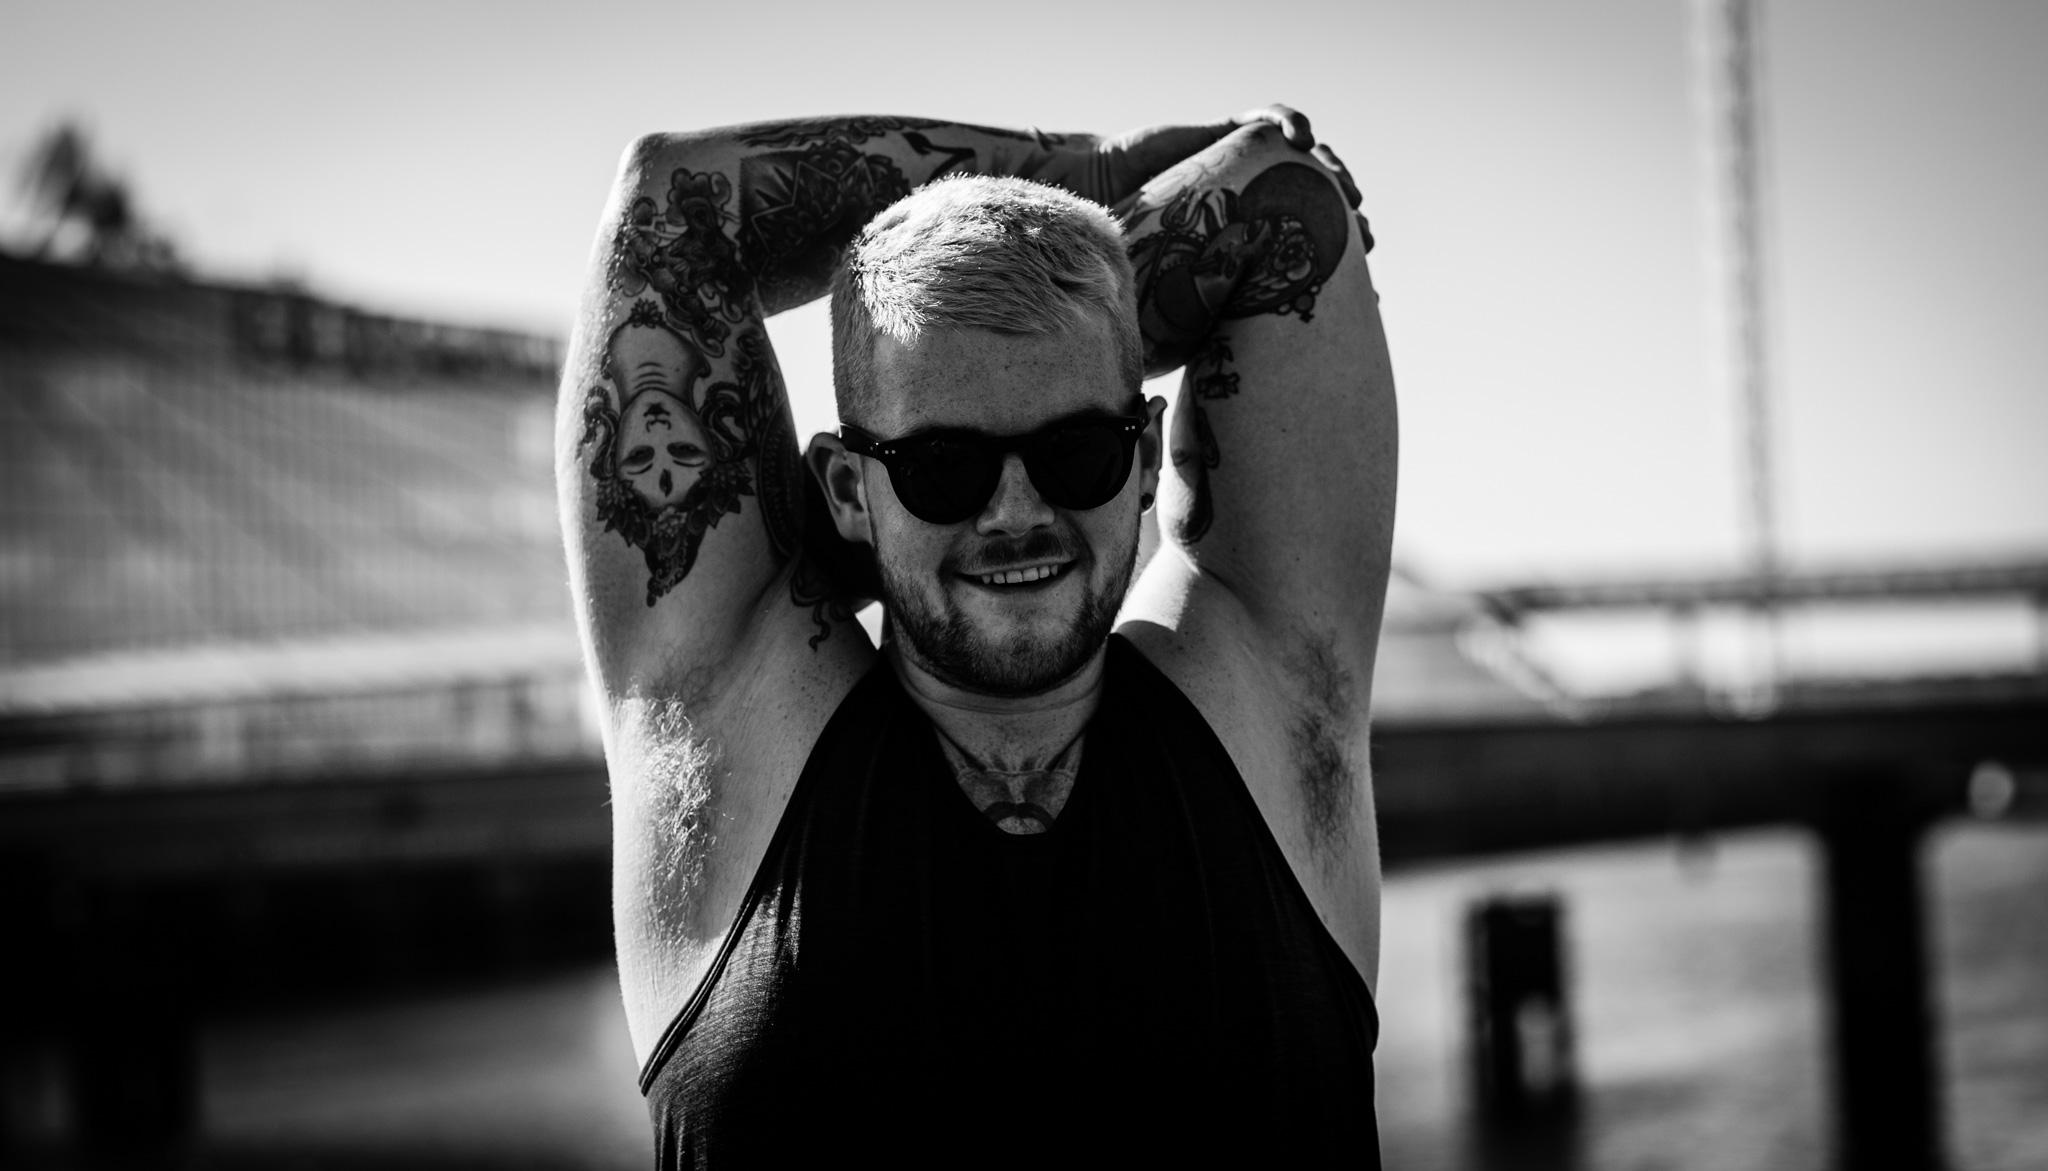 portrait of Kyle Gray // photograph by Calum McMillan